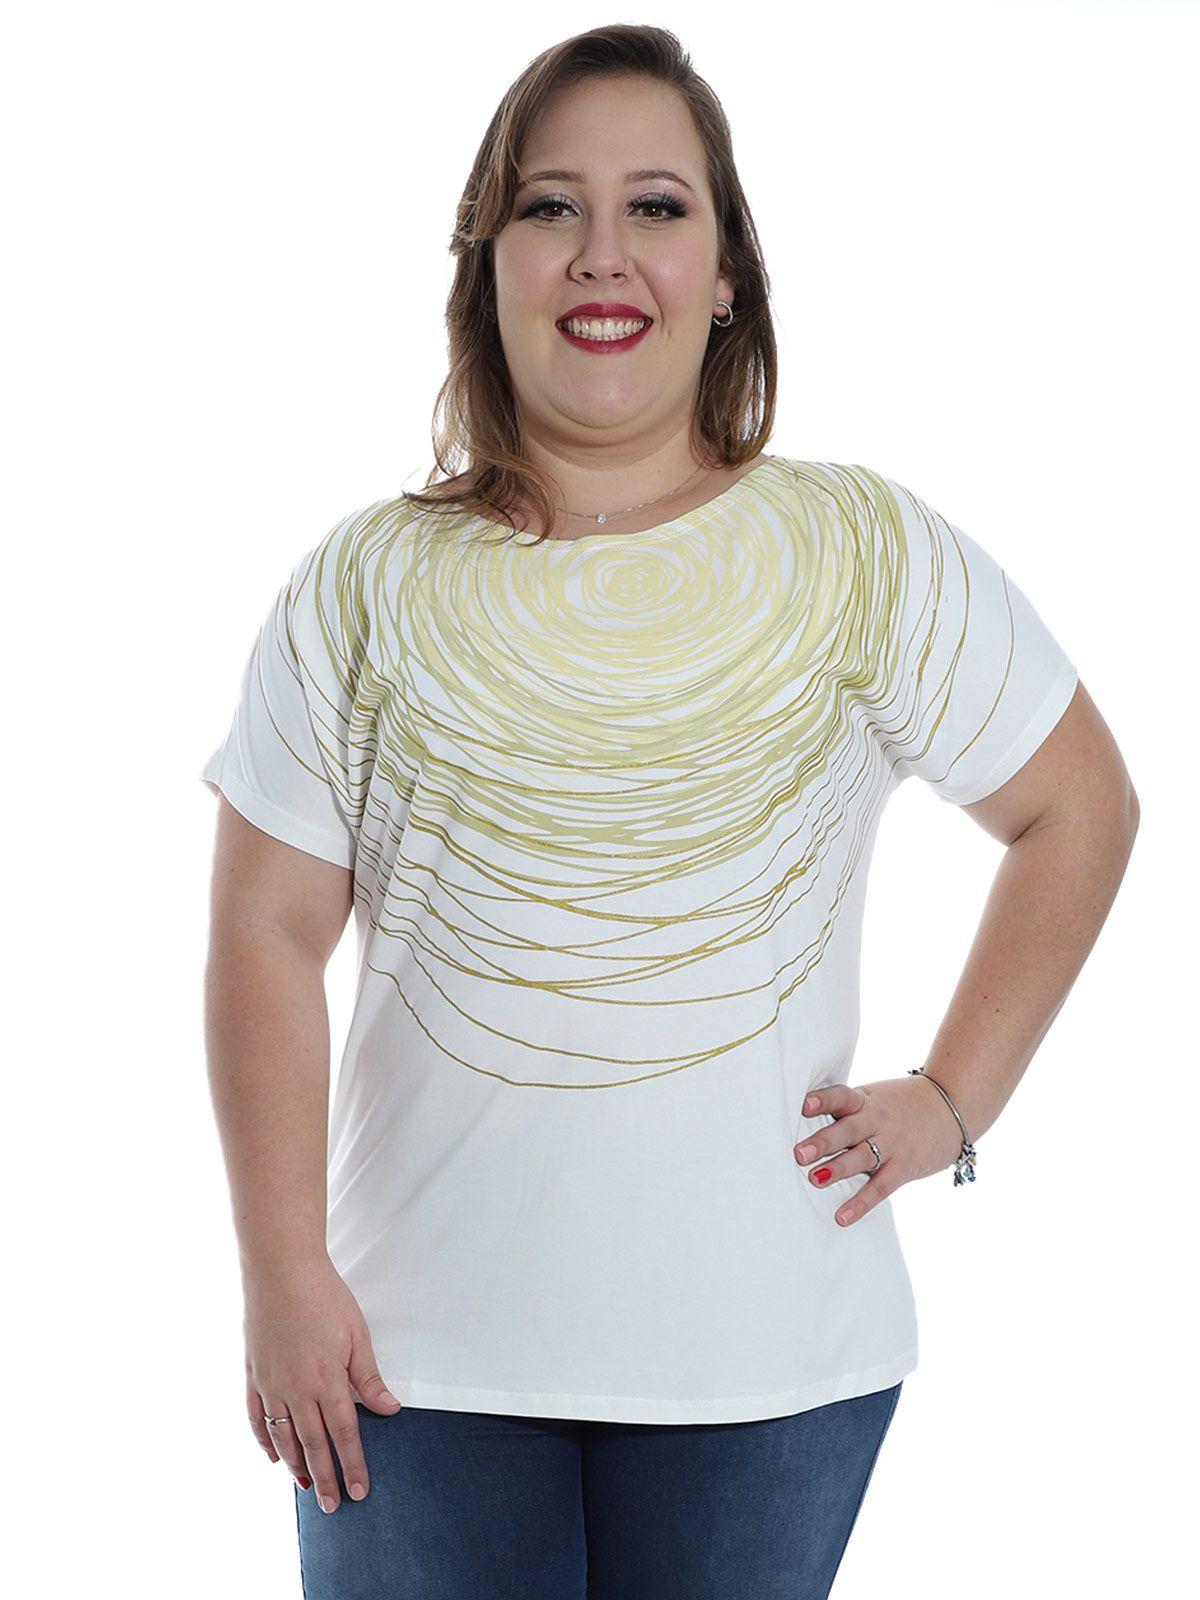 Blusa Plus Size KTS Frente com Estampa Color Branco